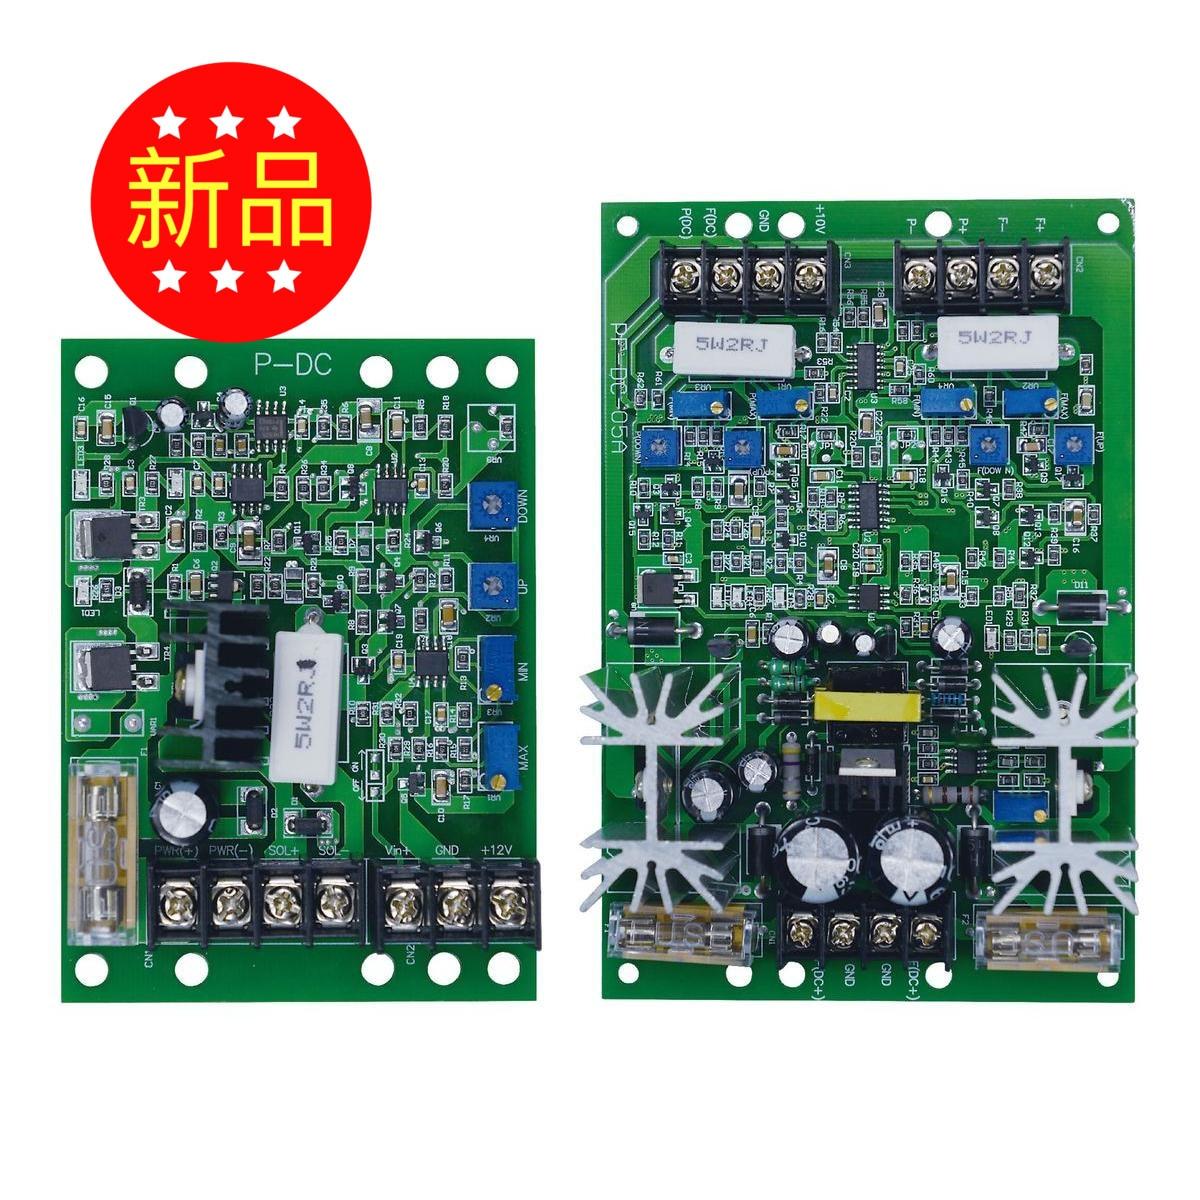 Proportional Valve Amplifier, PF-DC-24 Solenoid Valve Amplifier, Proportional Valve Controller komatsu pc 6 pc 7 hydraulic pump proportional solenoid valve 702 21 07010